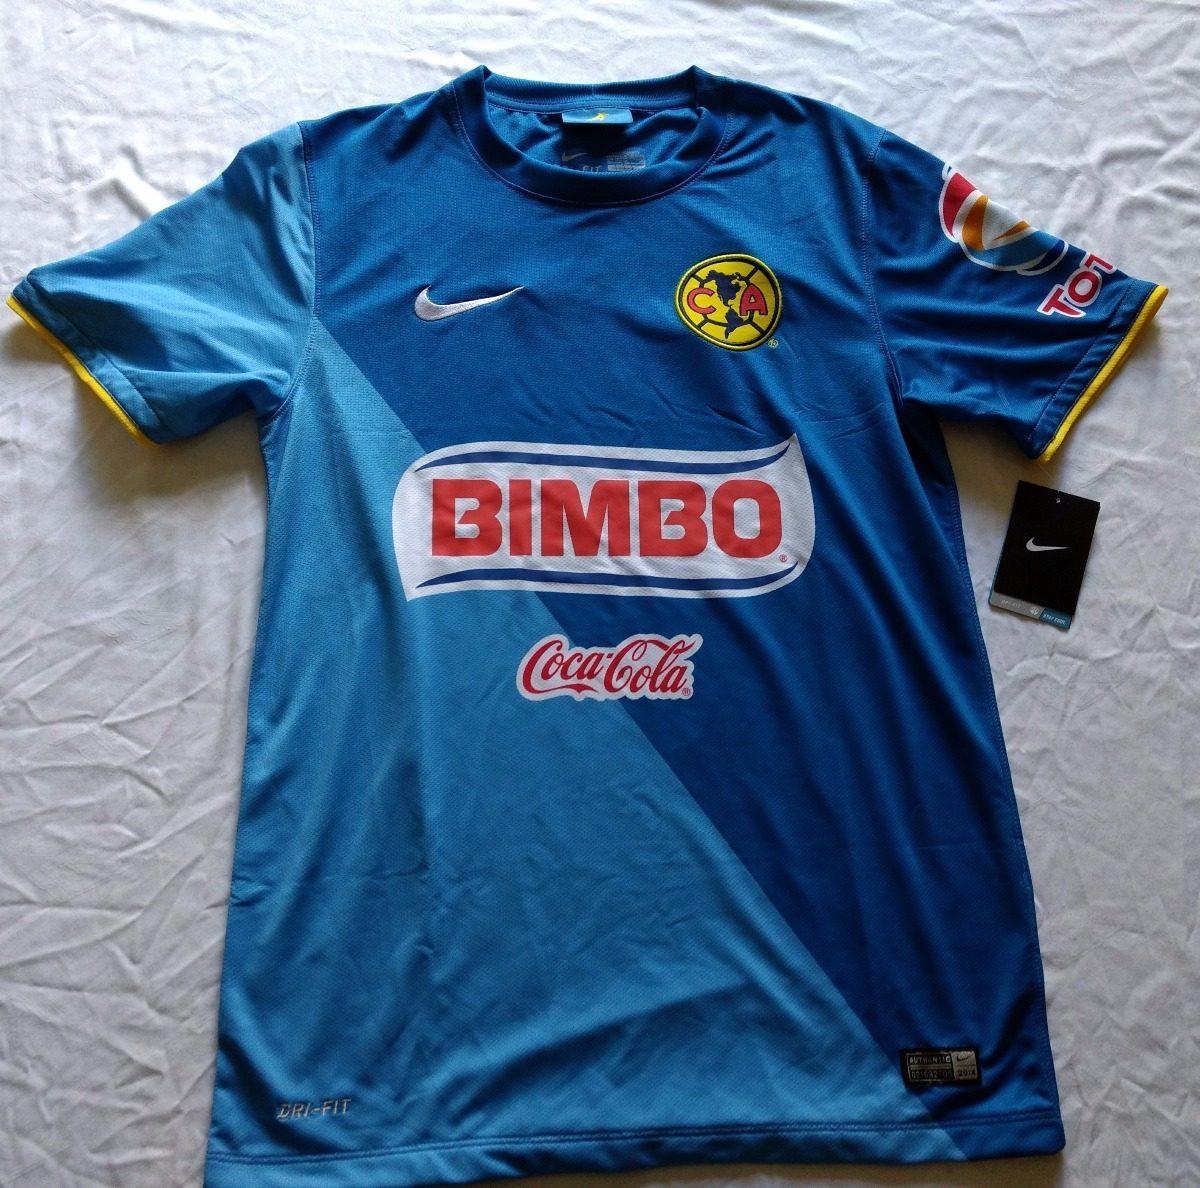 5d1a14e3ca20d Jersey Playera Aguilas De America Nike 2014 3ra Talla Ch -   989.00 ...